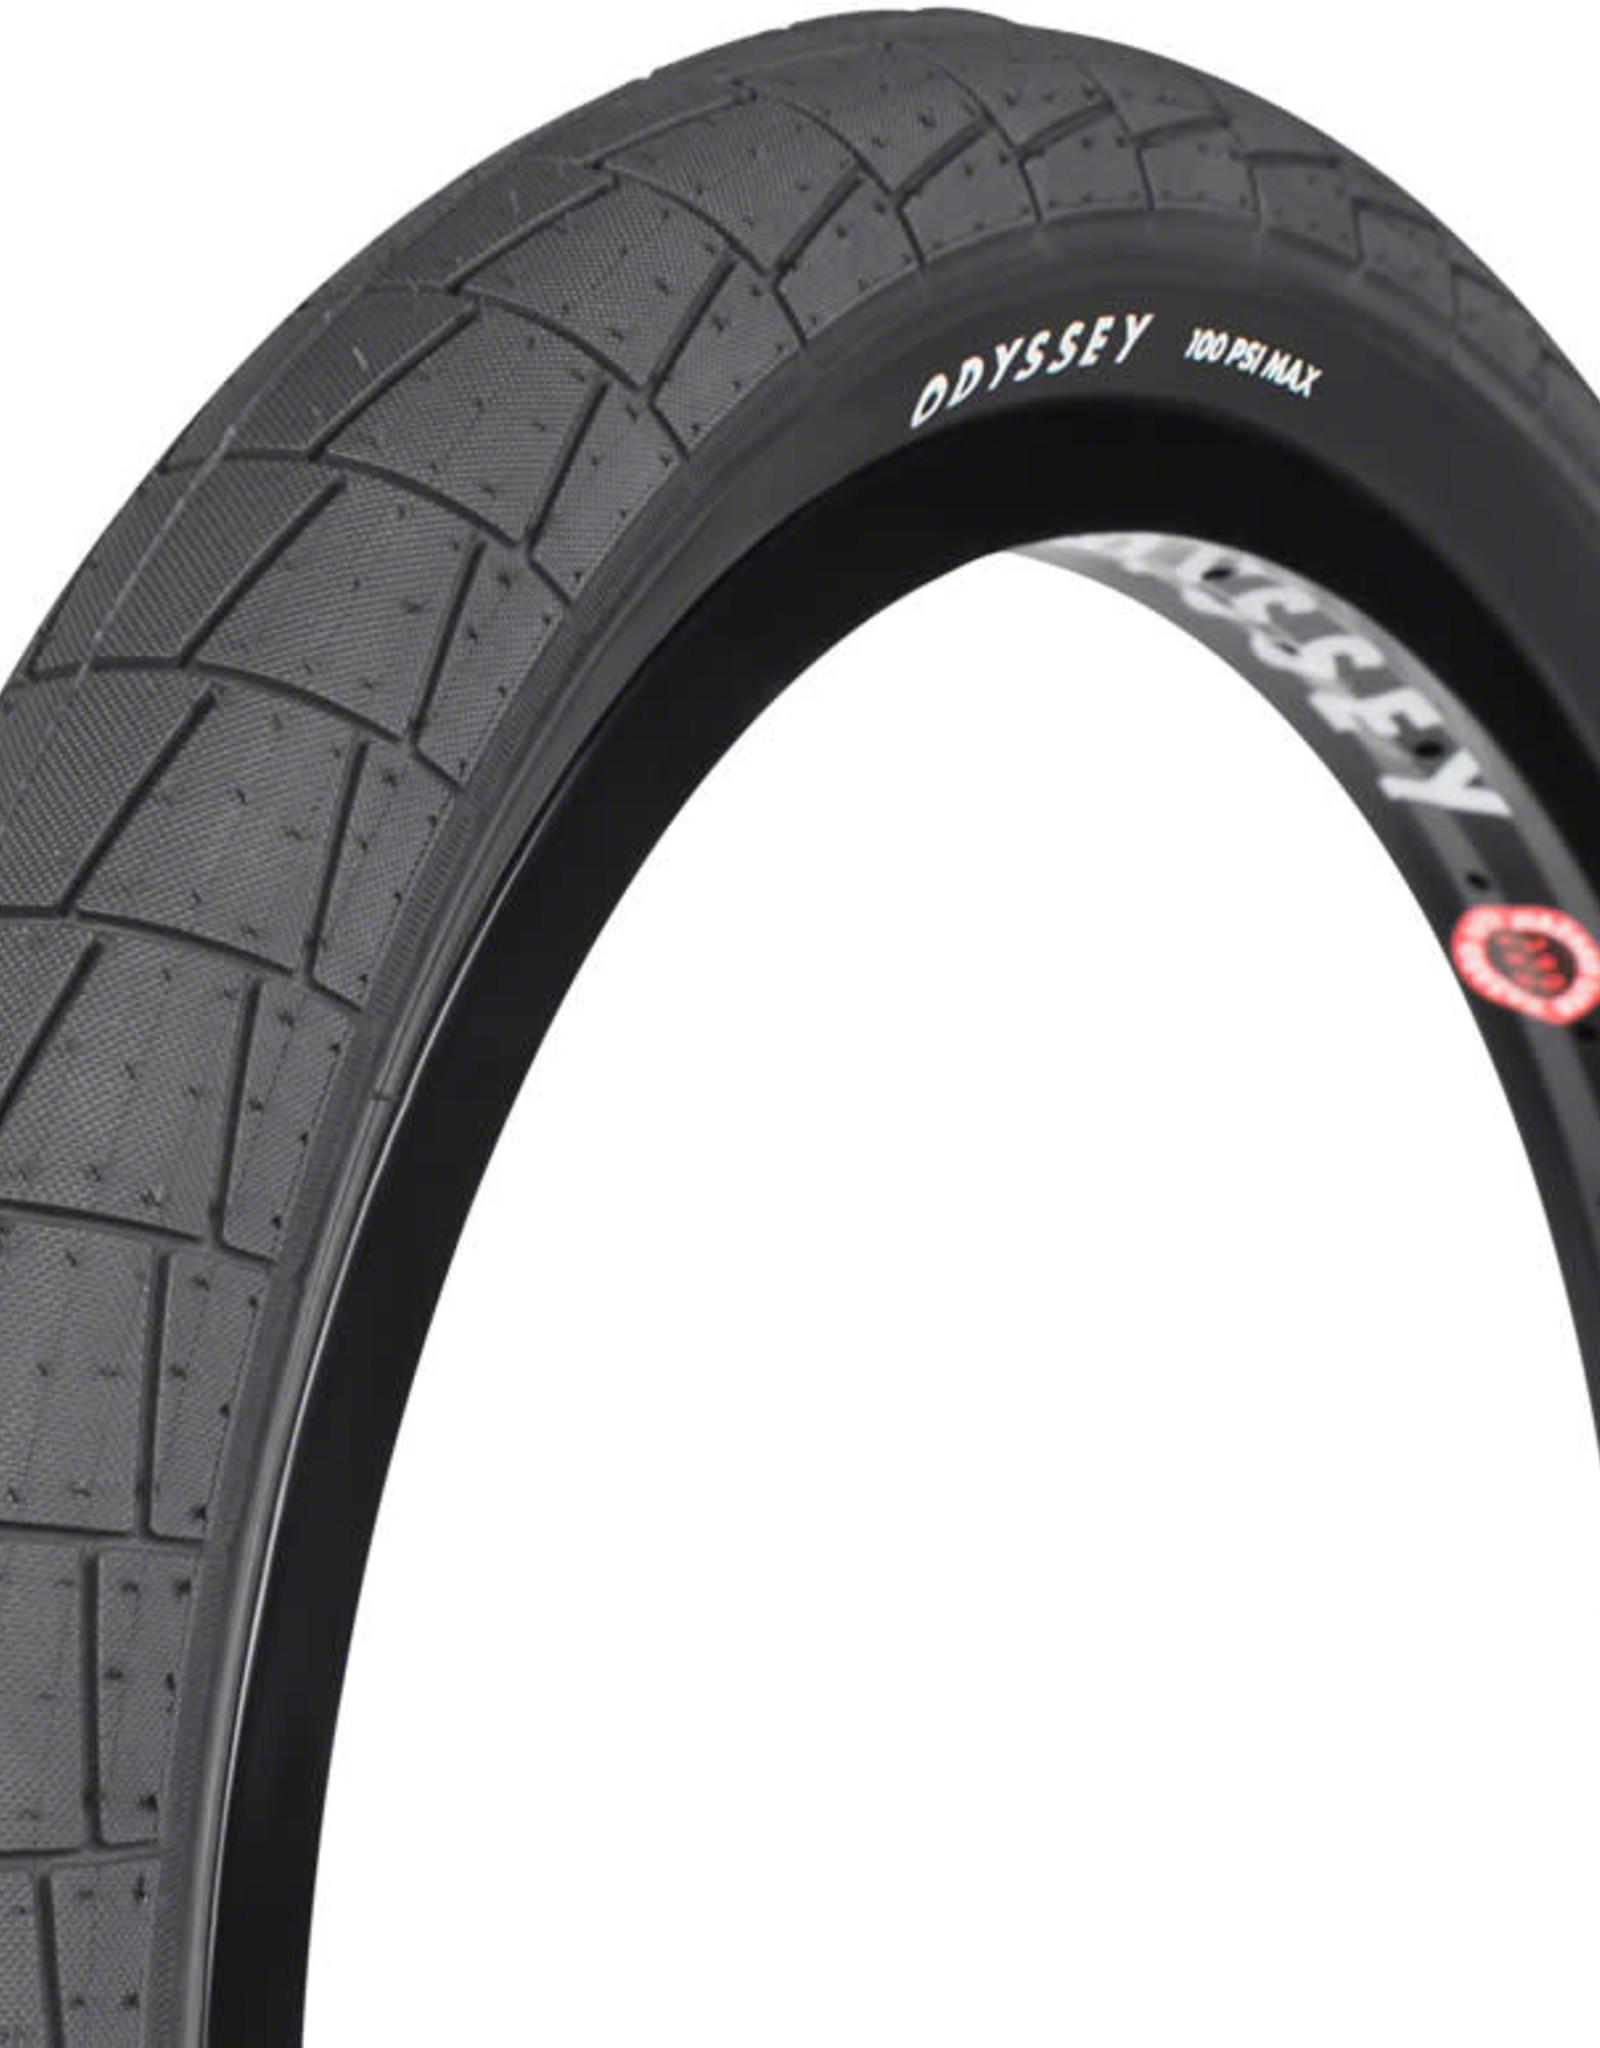 Odyssey Odyssey Raiford Tire 20 x 2.4 Black